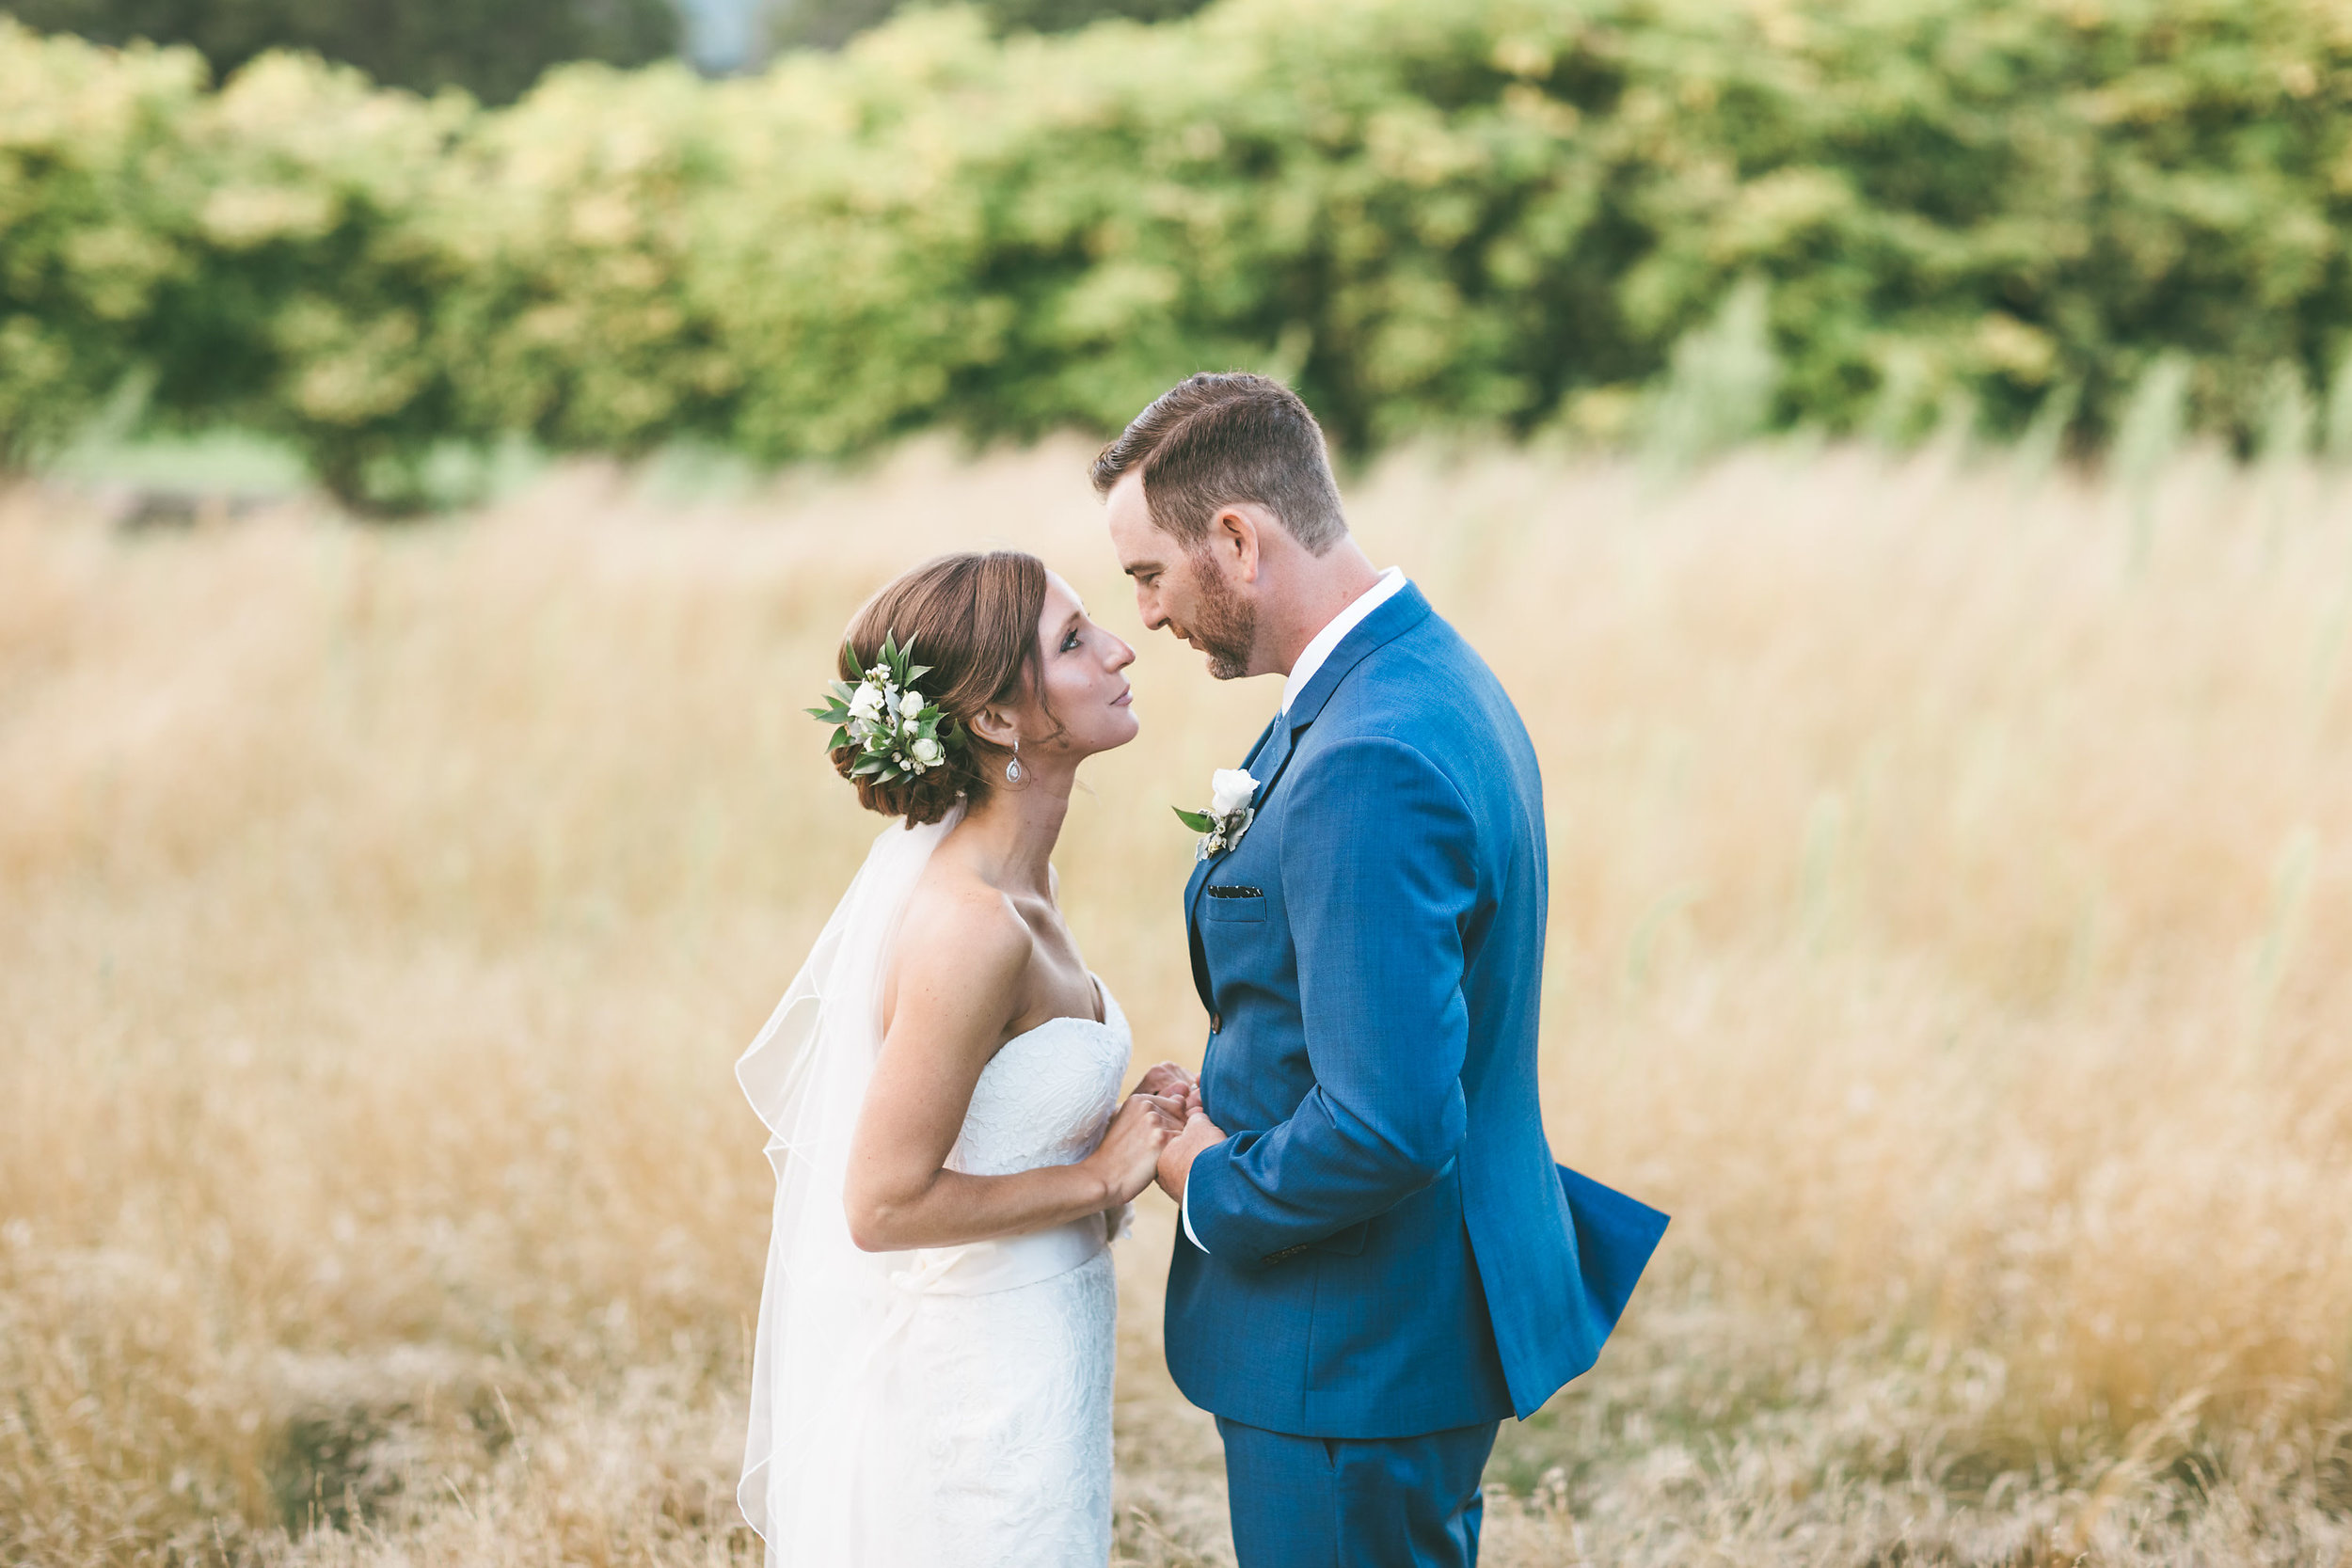 meaghan___darryl_wedding___danielcarusophotography___1050.jpg